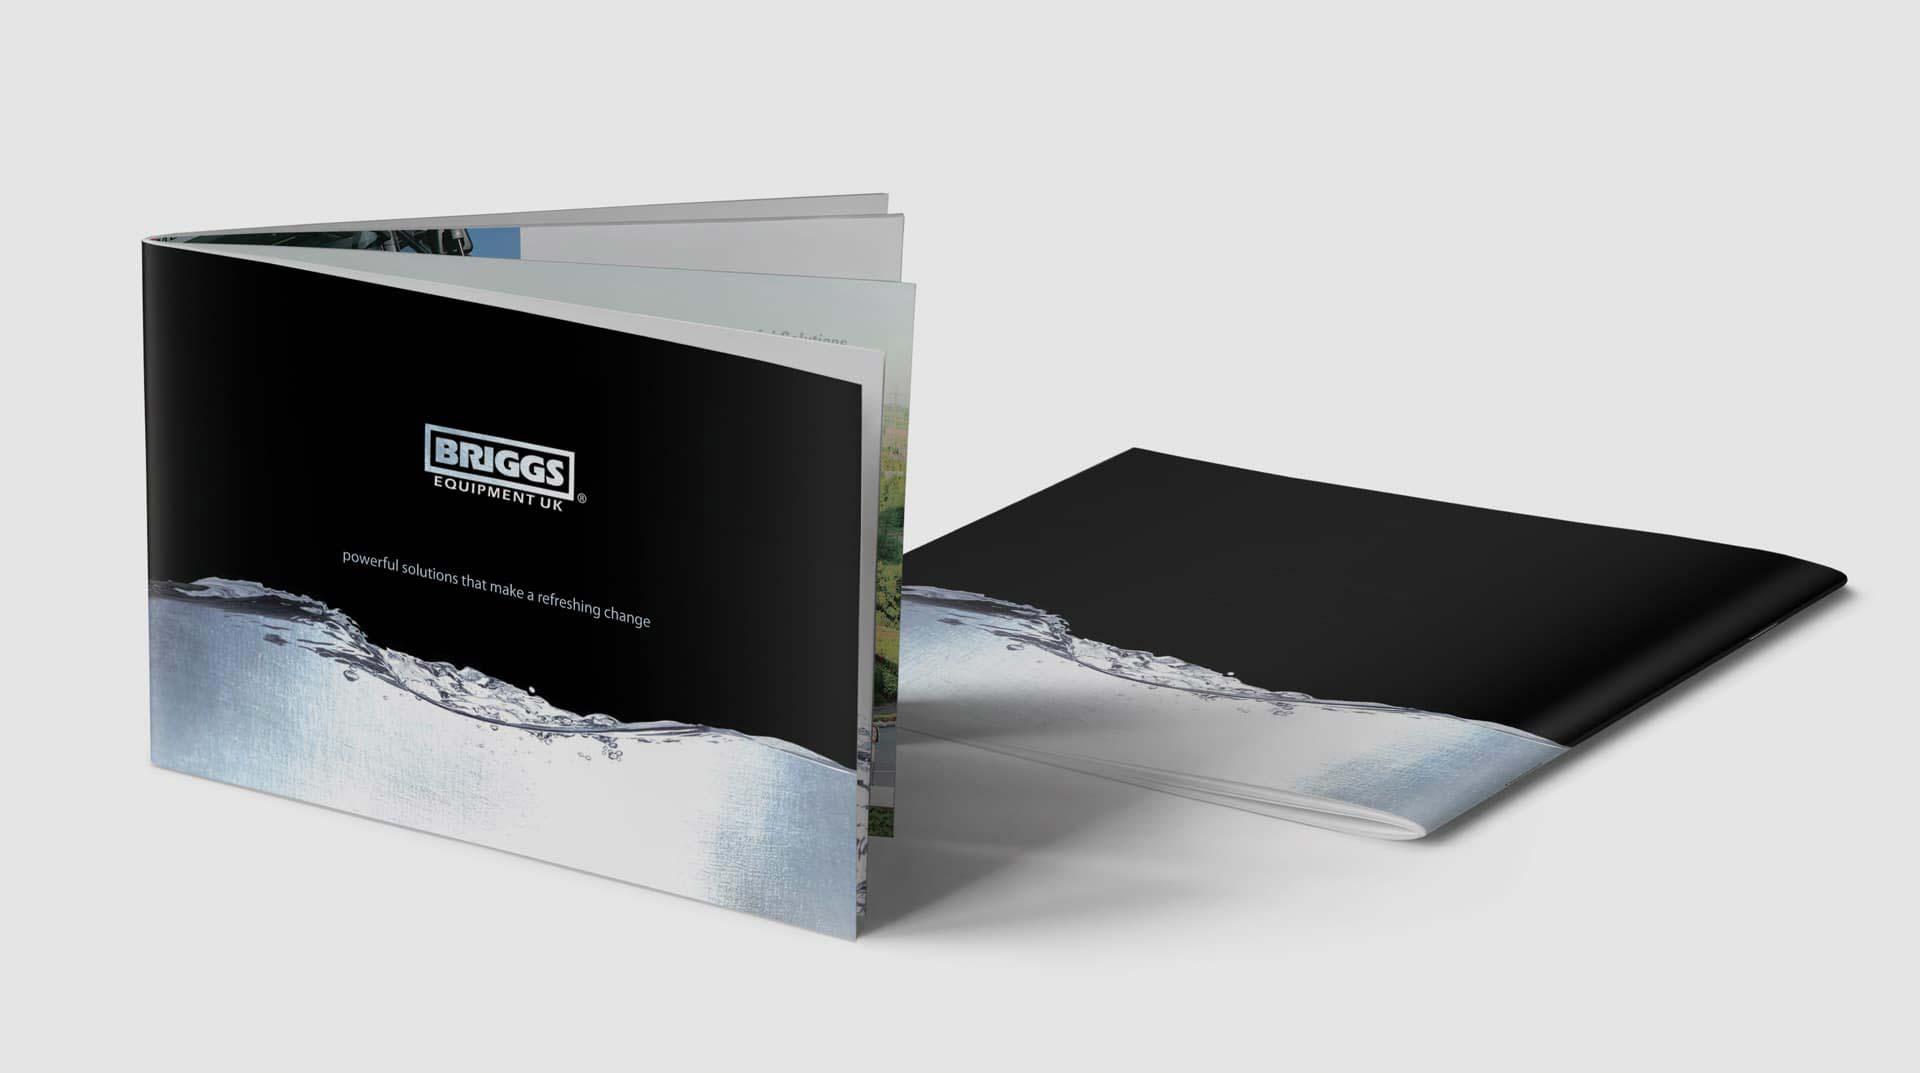 Briggs Equipment Brochure Covers